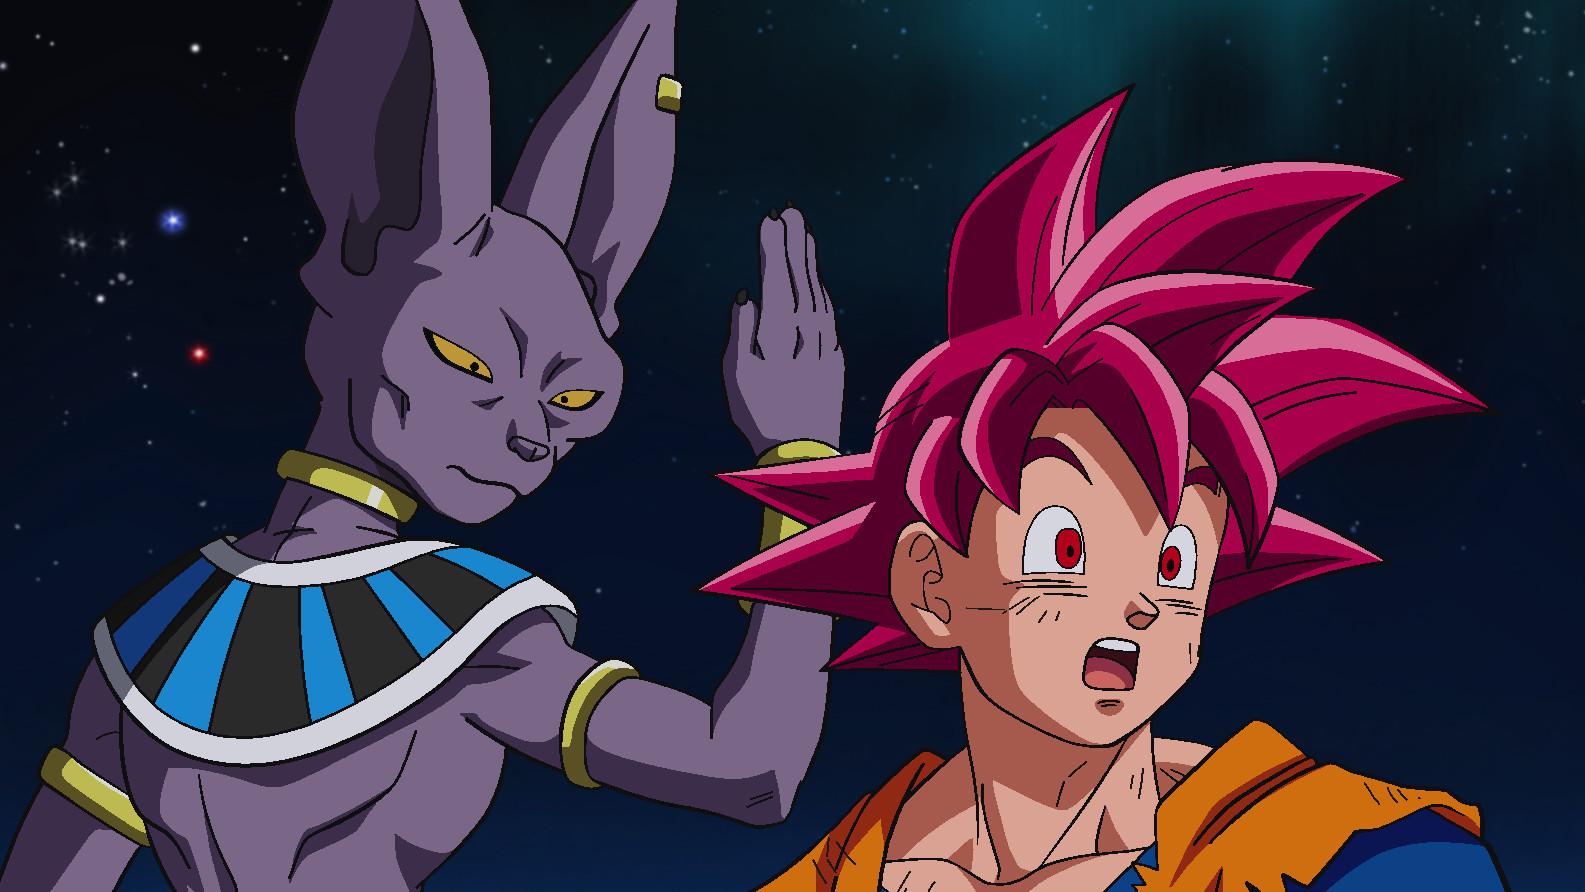 Watch Dragon Ball Super Season 1 Episode 12 Sub & Dub